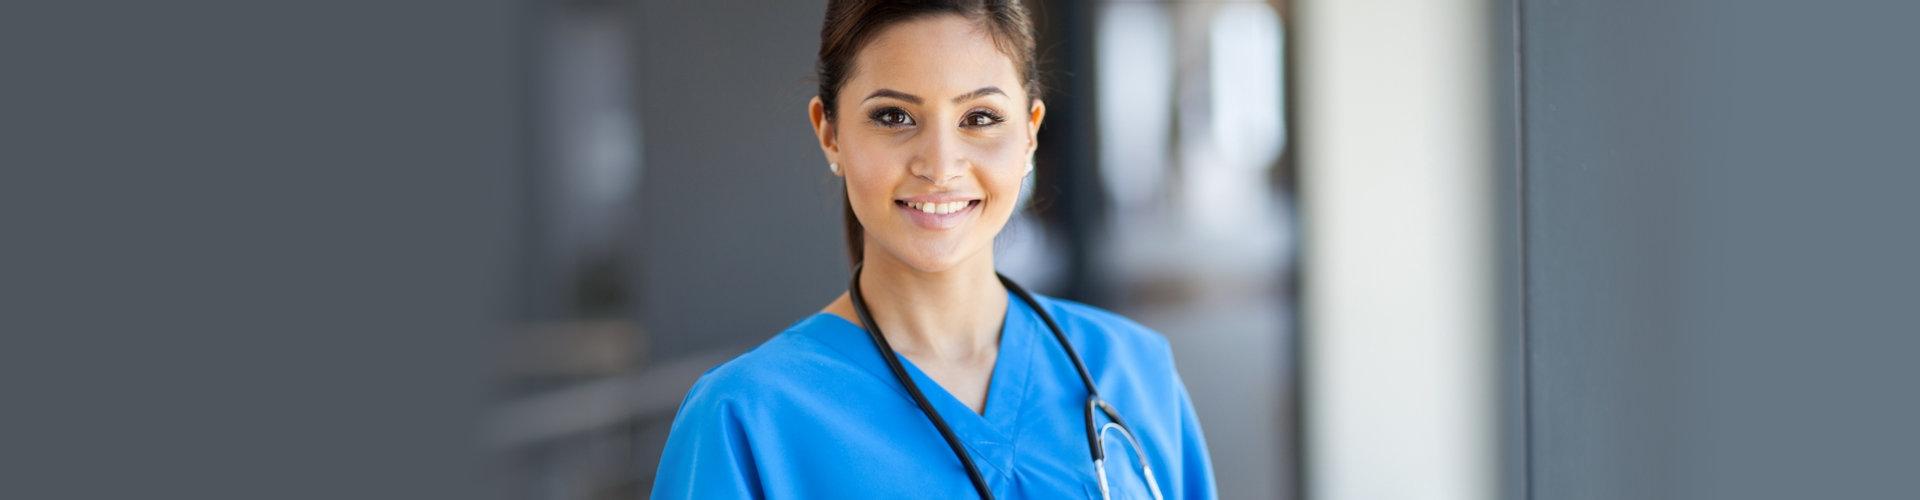 female nurse